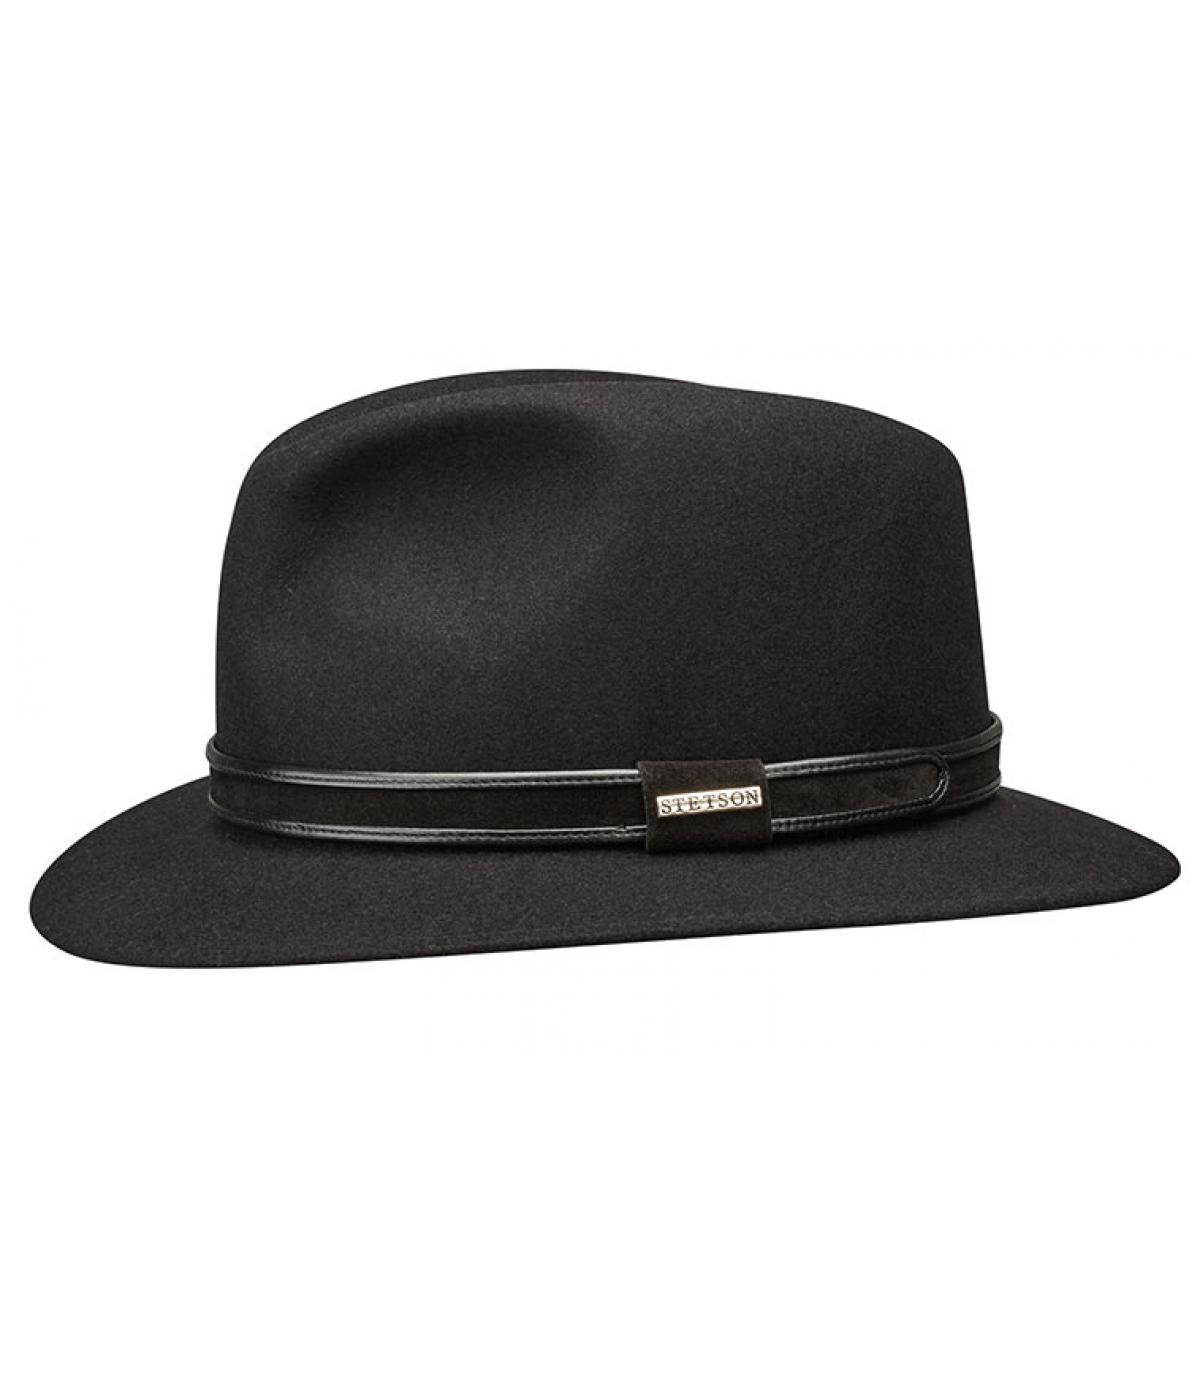 d8e858c6a3a Fedora hat - Online hats shop